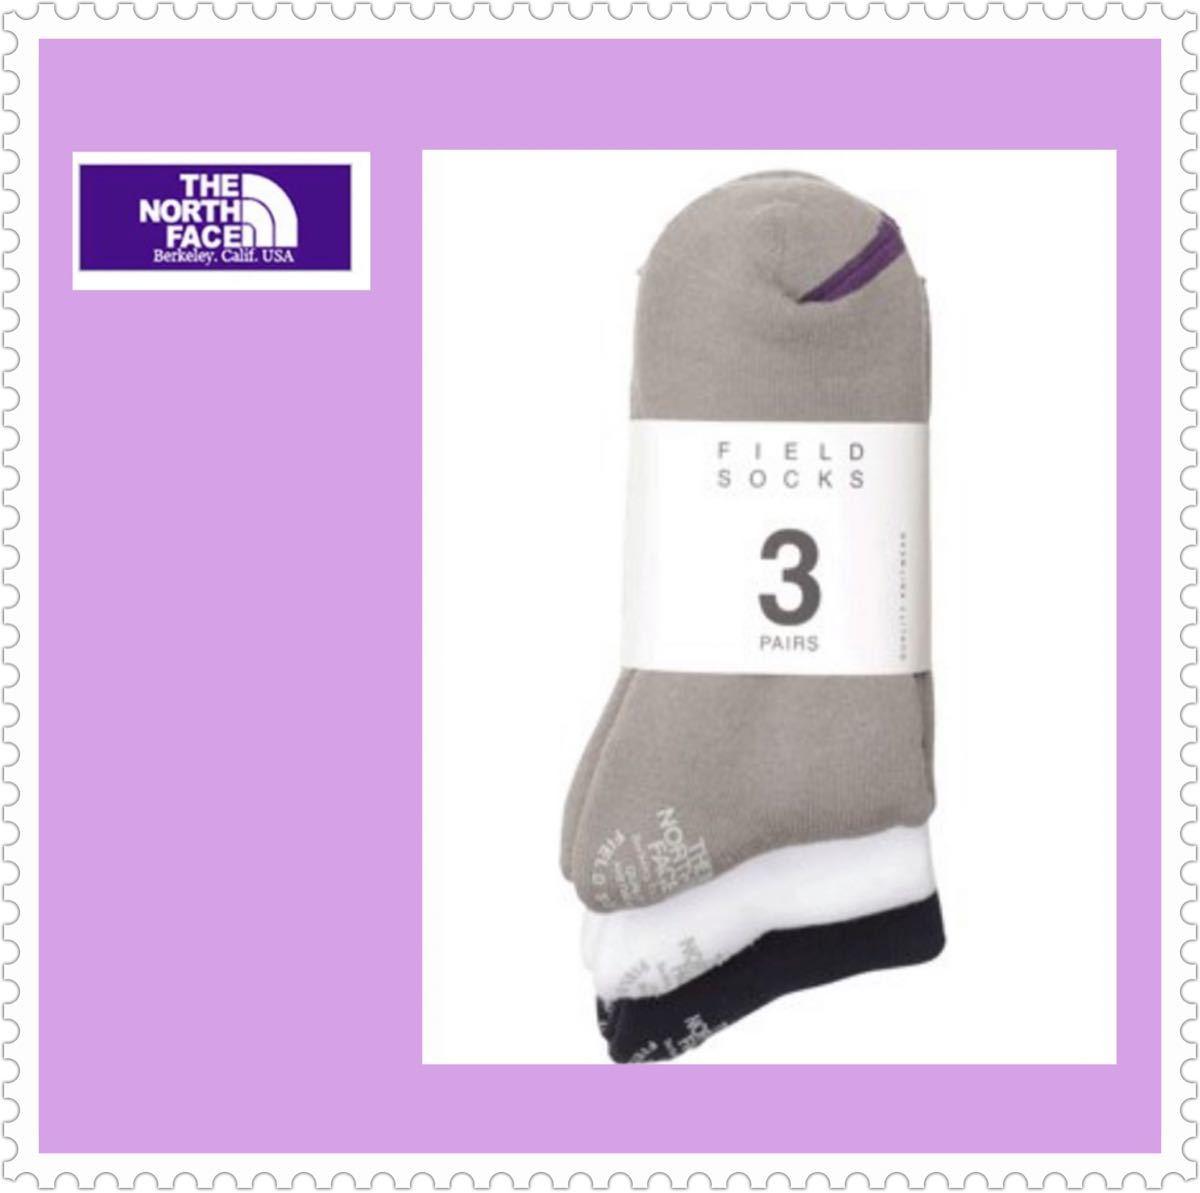 ☆THE NORTH FACE☆ザ ノースフェイス☆NN8962N フィールドソックス 3色セット 靴下